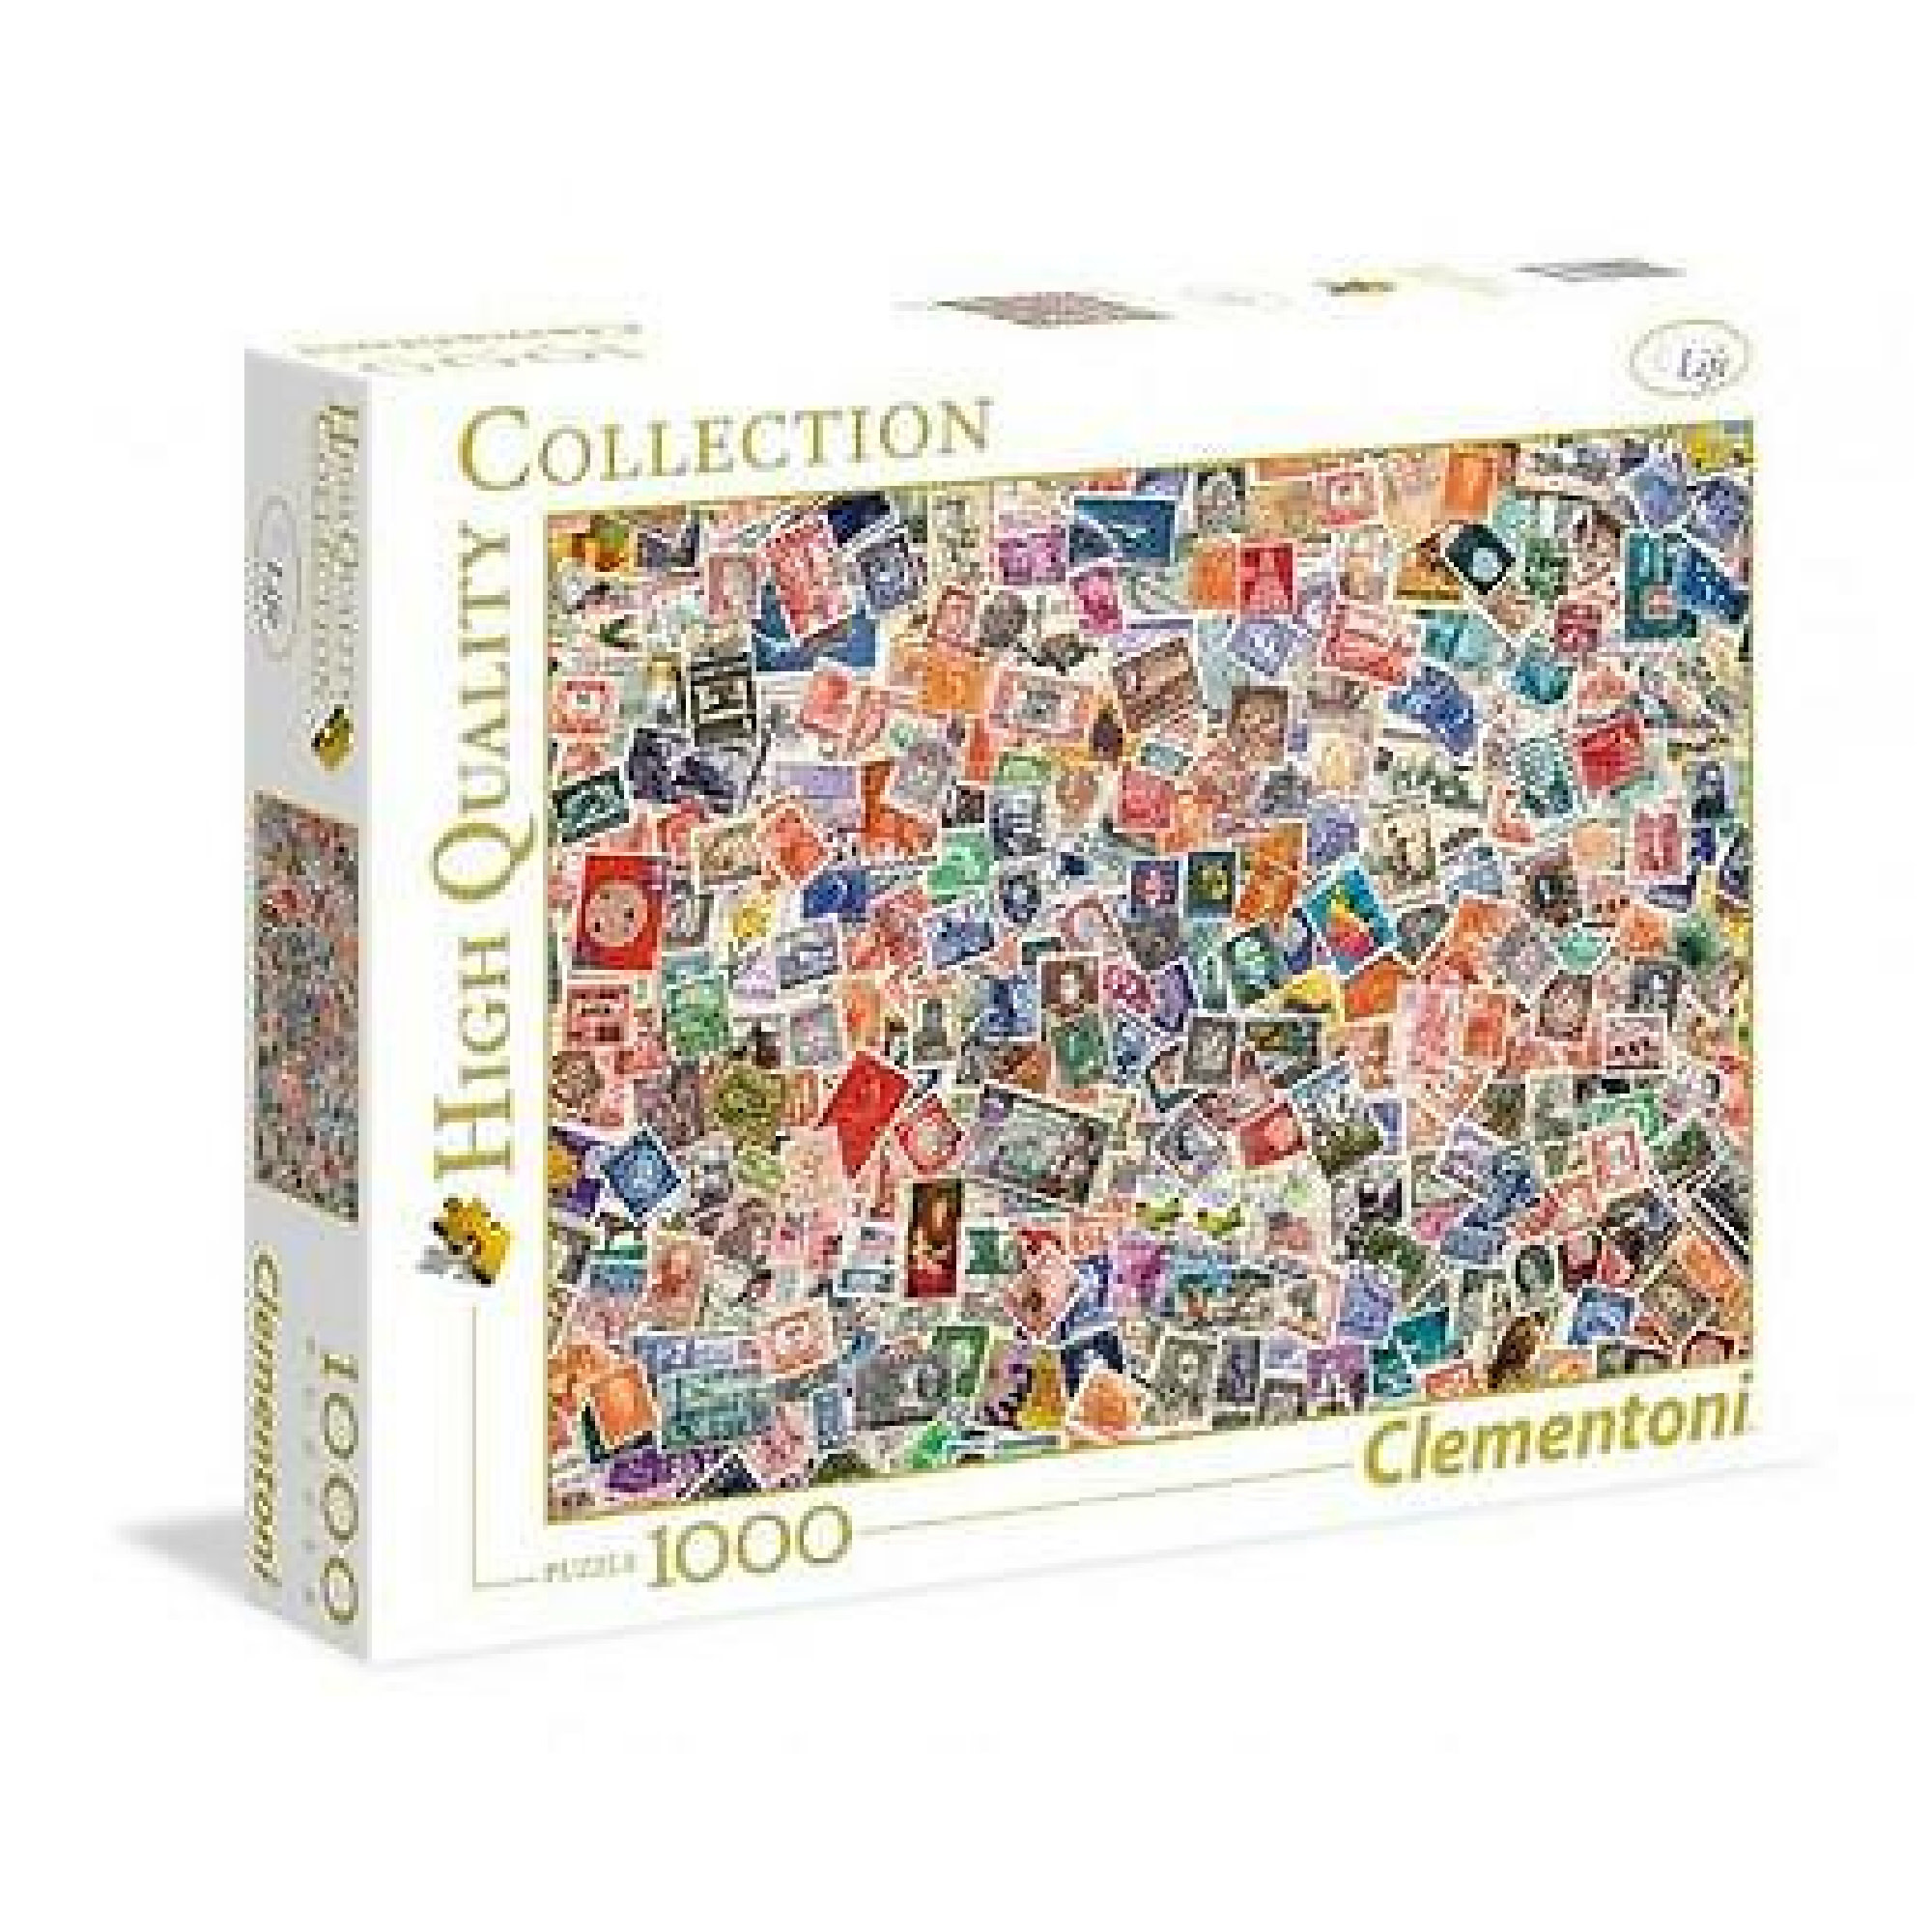 Clementoni Puzzle 1000: Timbres